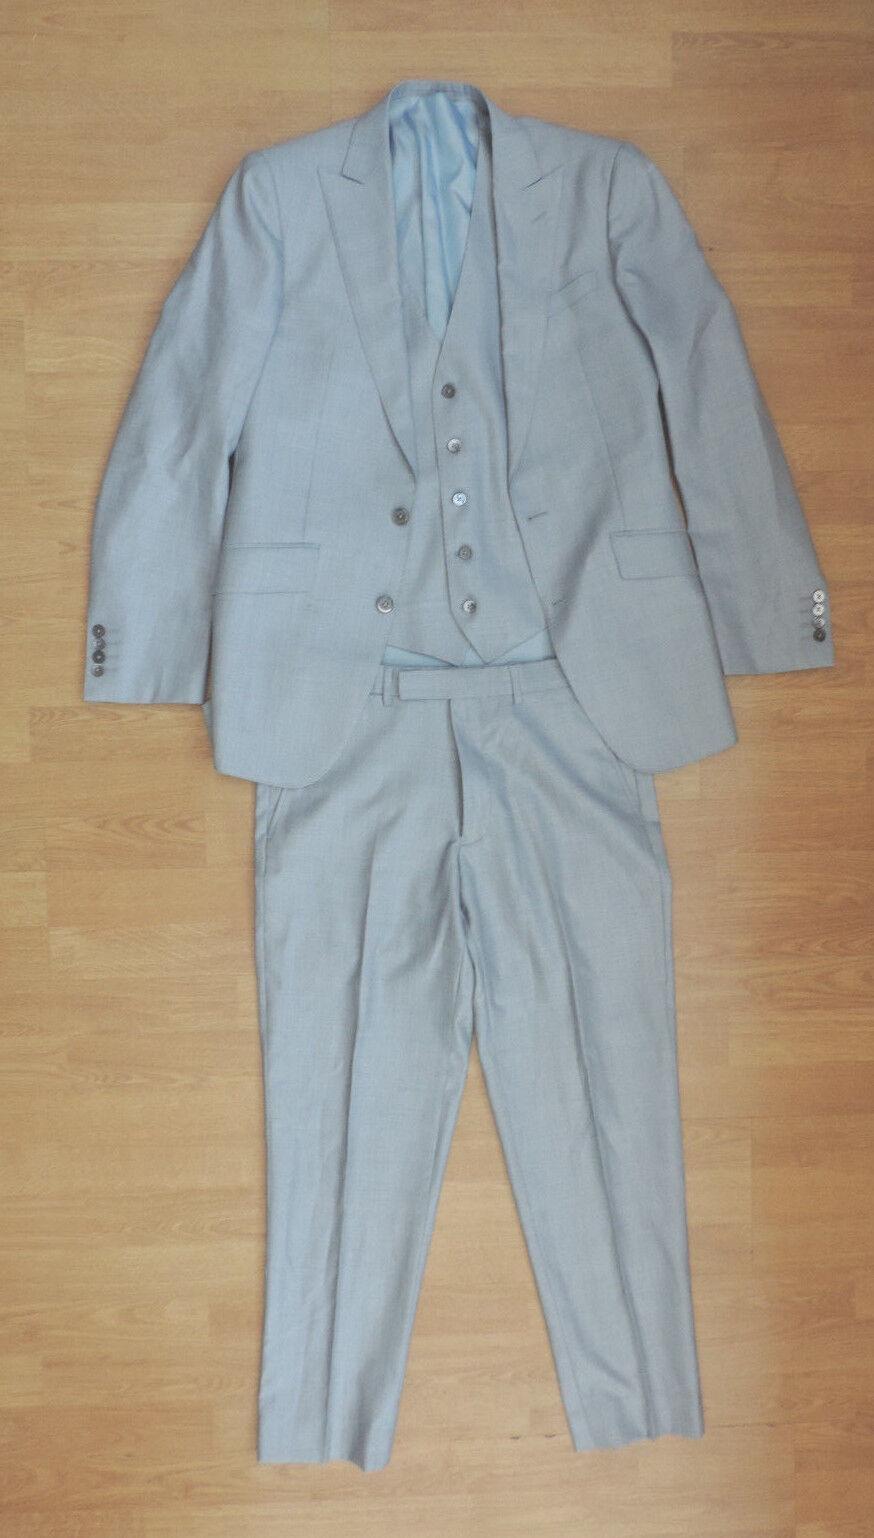 Herren MOSS BROS 1851 LONDON 3 Piece Suit TailoROT Fit Silk Wool Blend Blau F5-B4